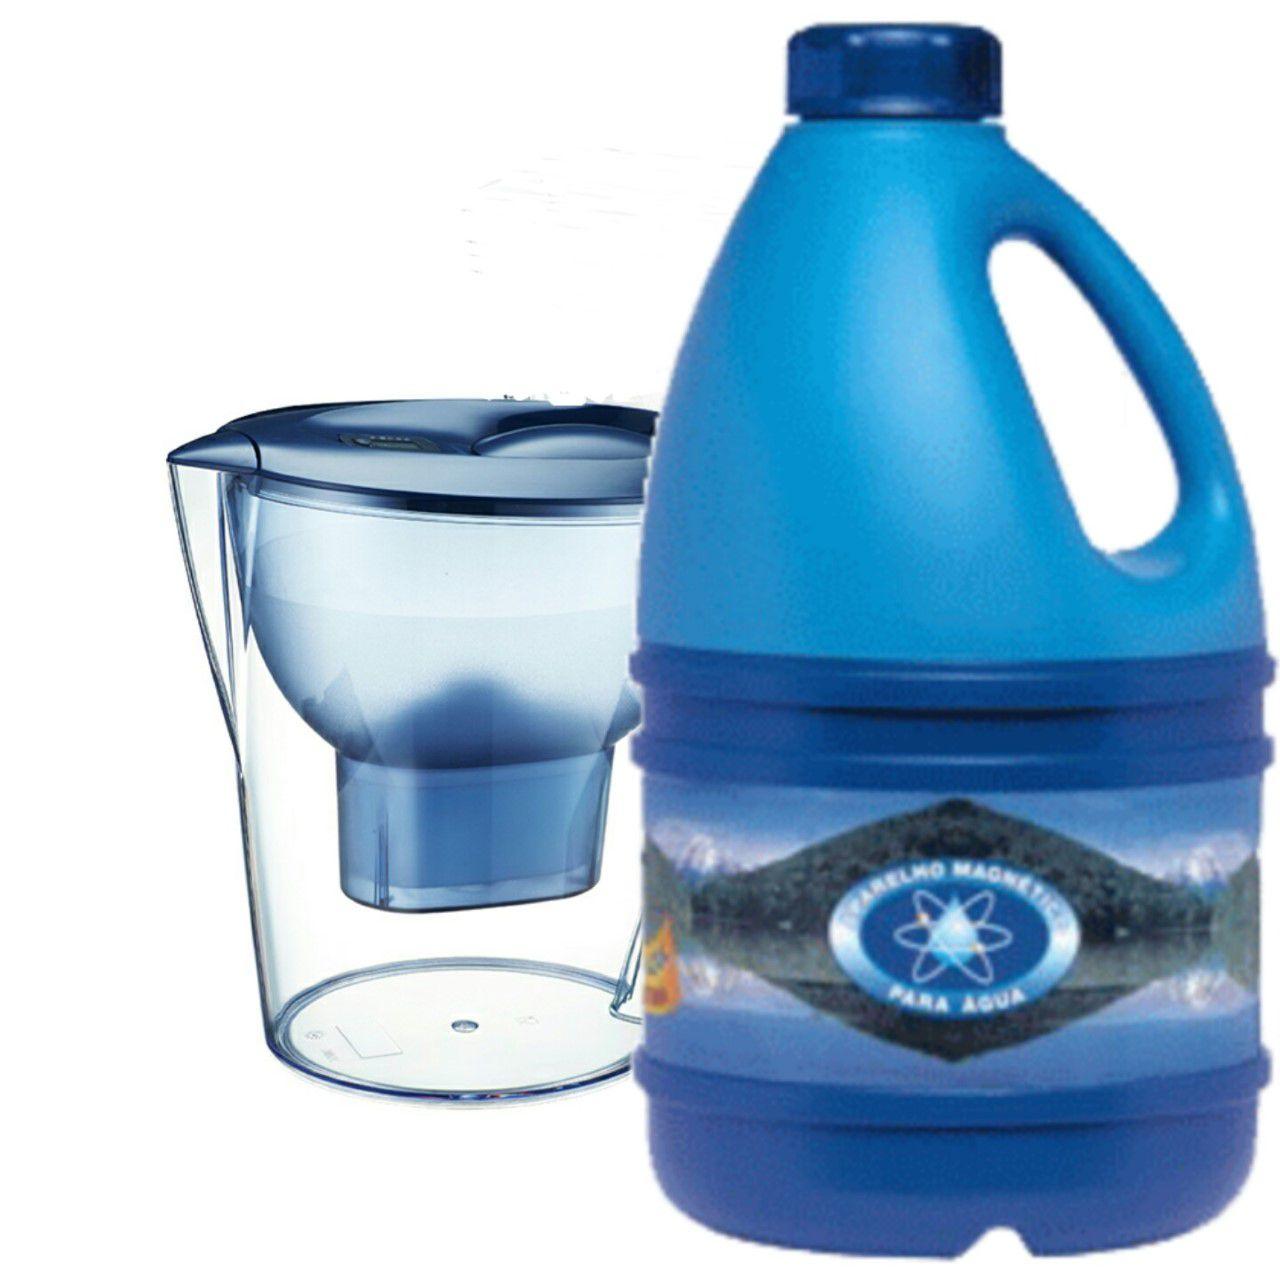 Jarra Azul Magnética + Purificador Portátil de Brinde